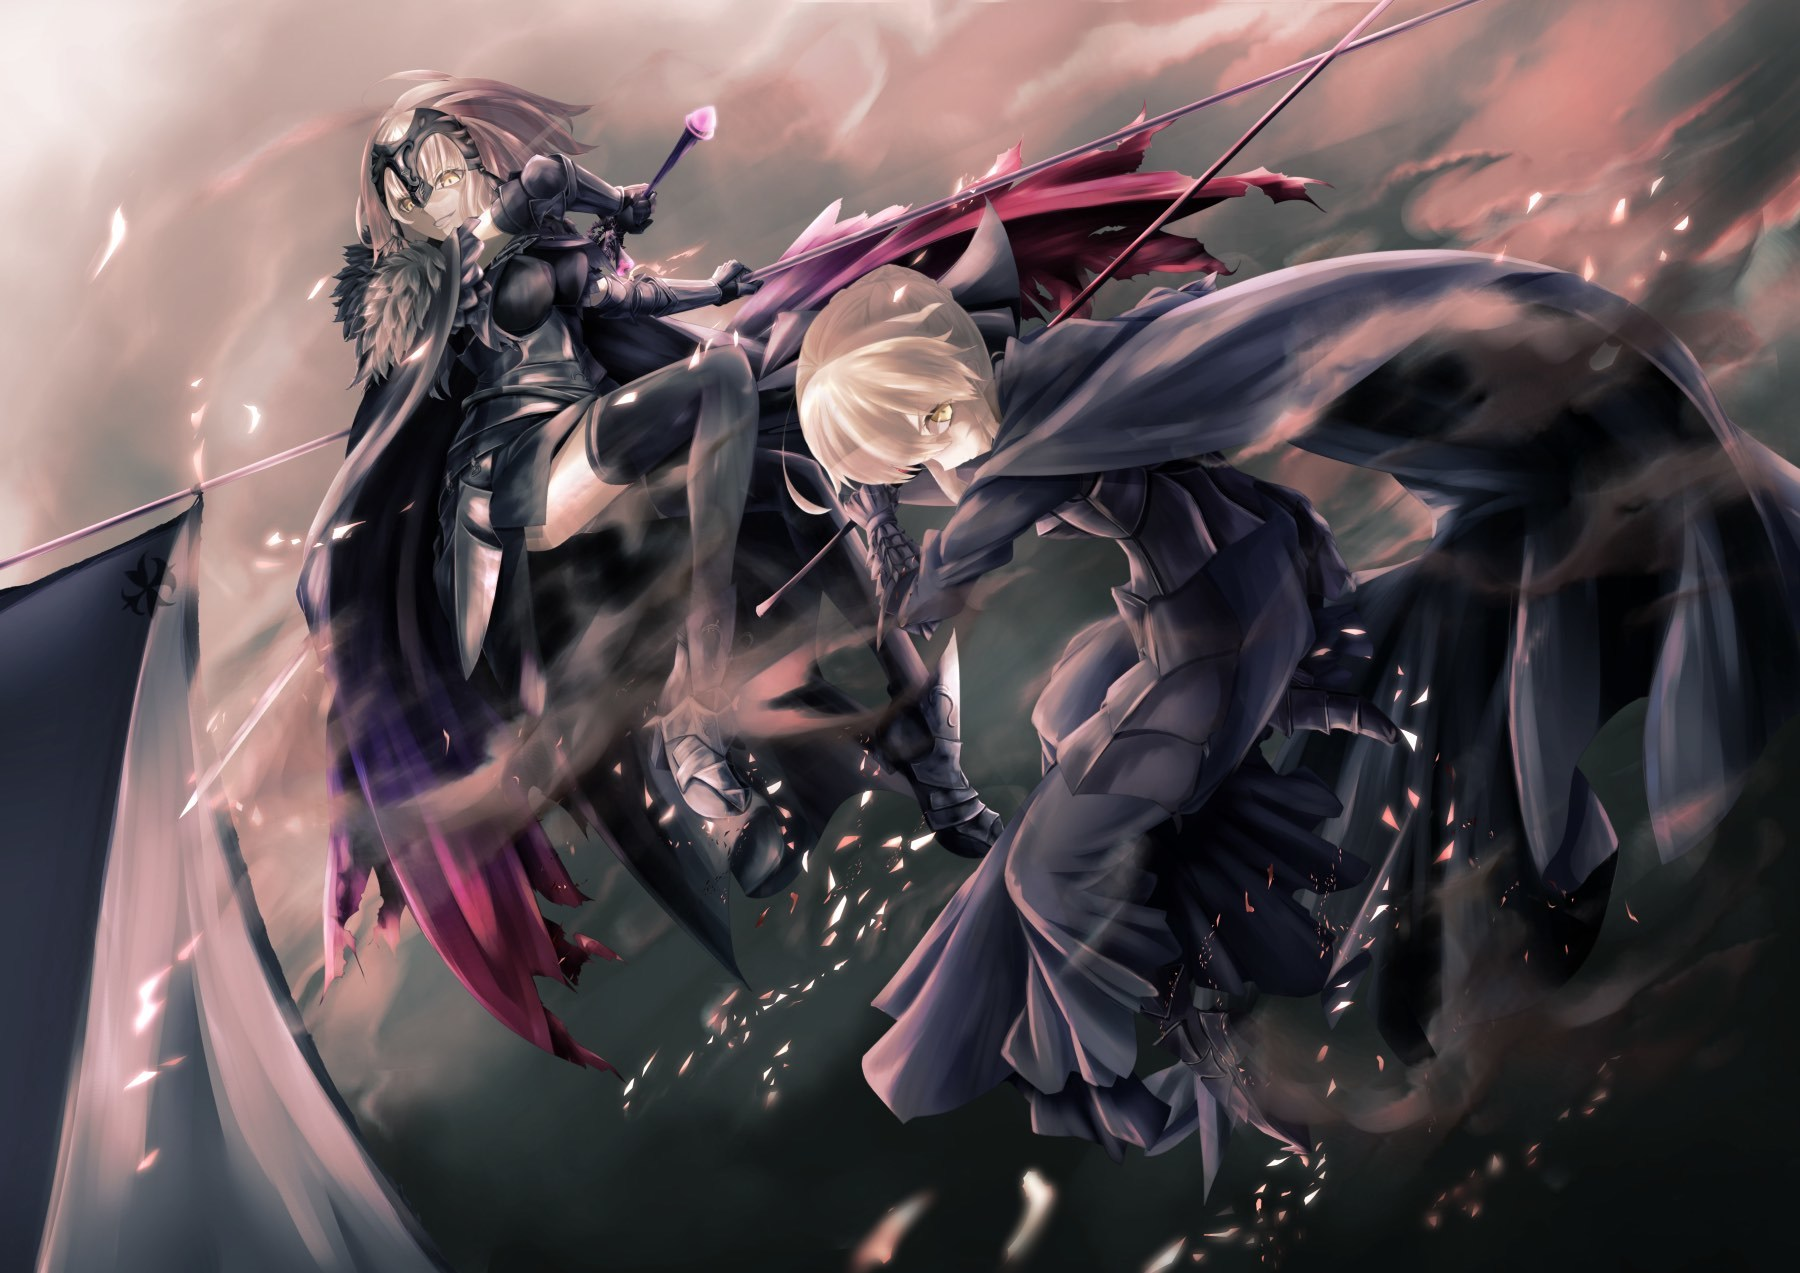 Fate grandorder saber alter joan alter no - 2017 anime wallpaper ...